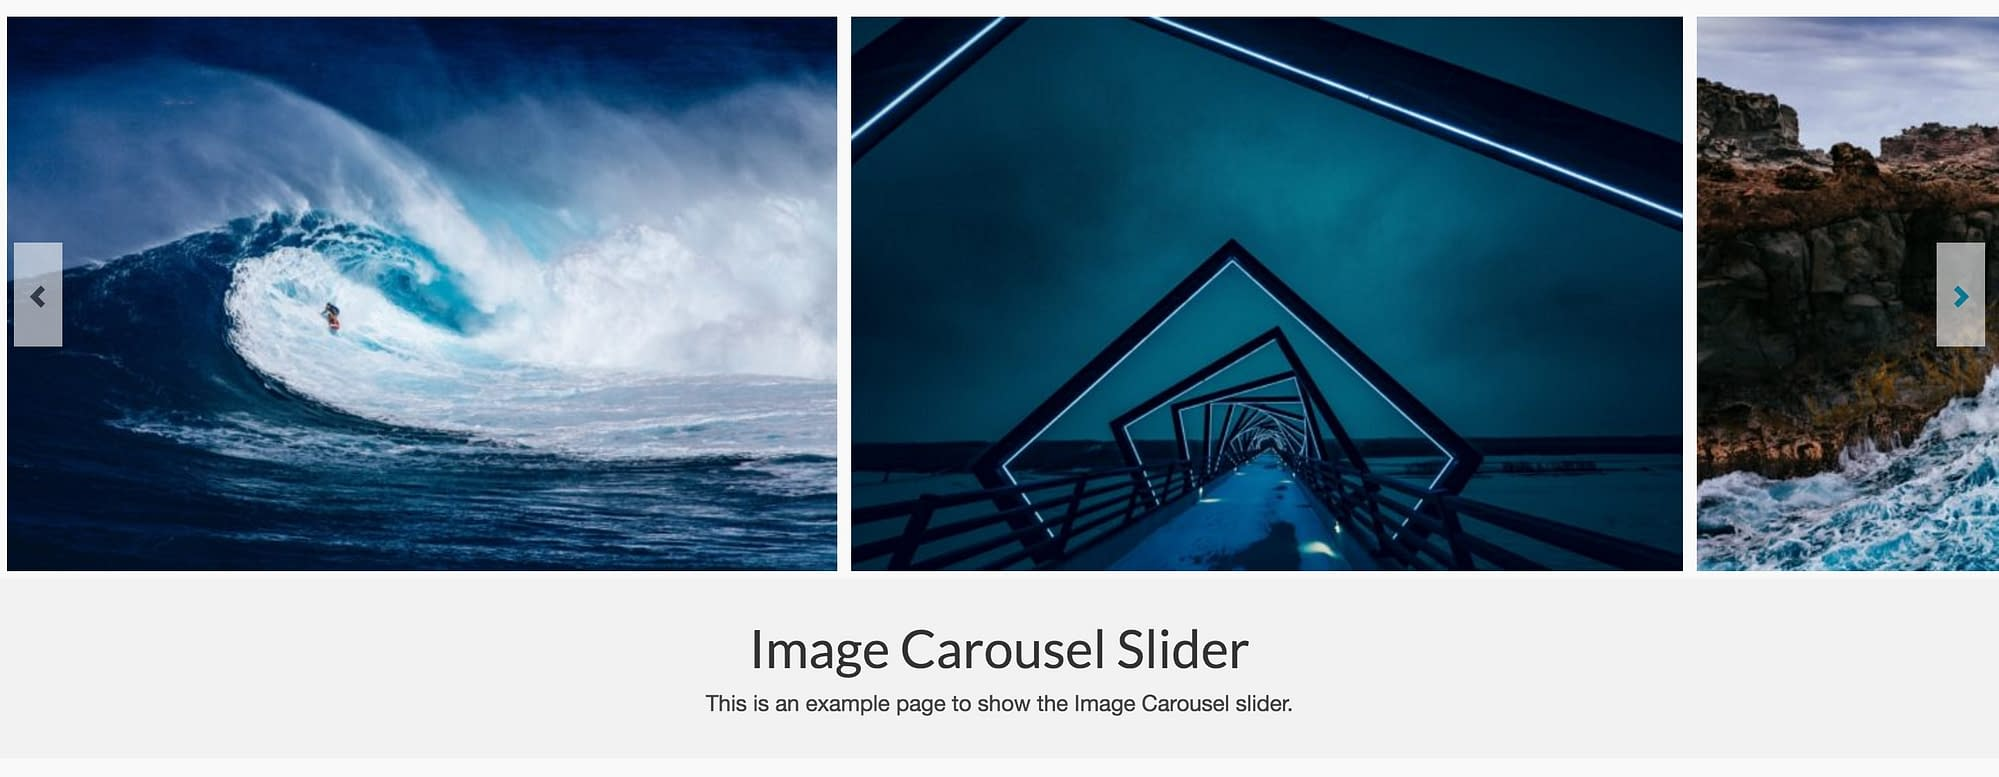 Image Carousel Slider Virtue Premium-min